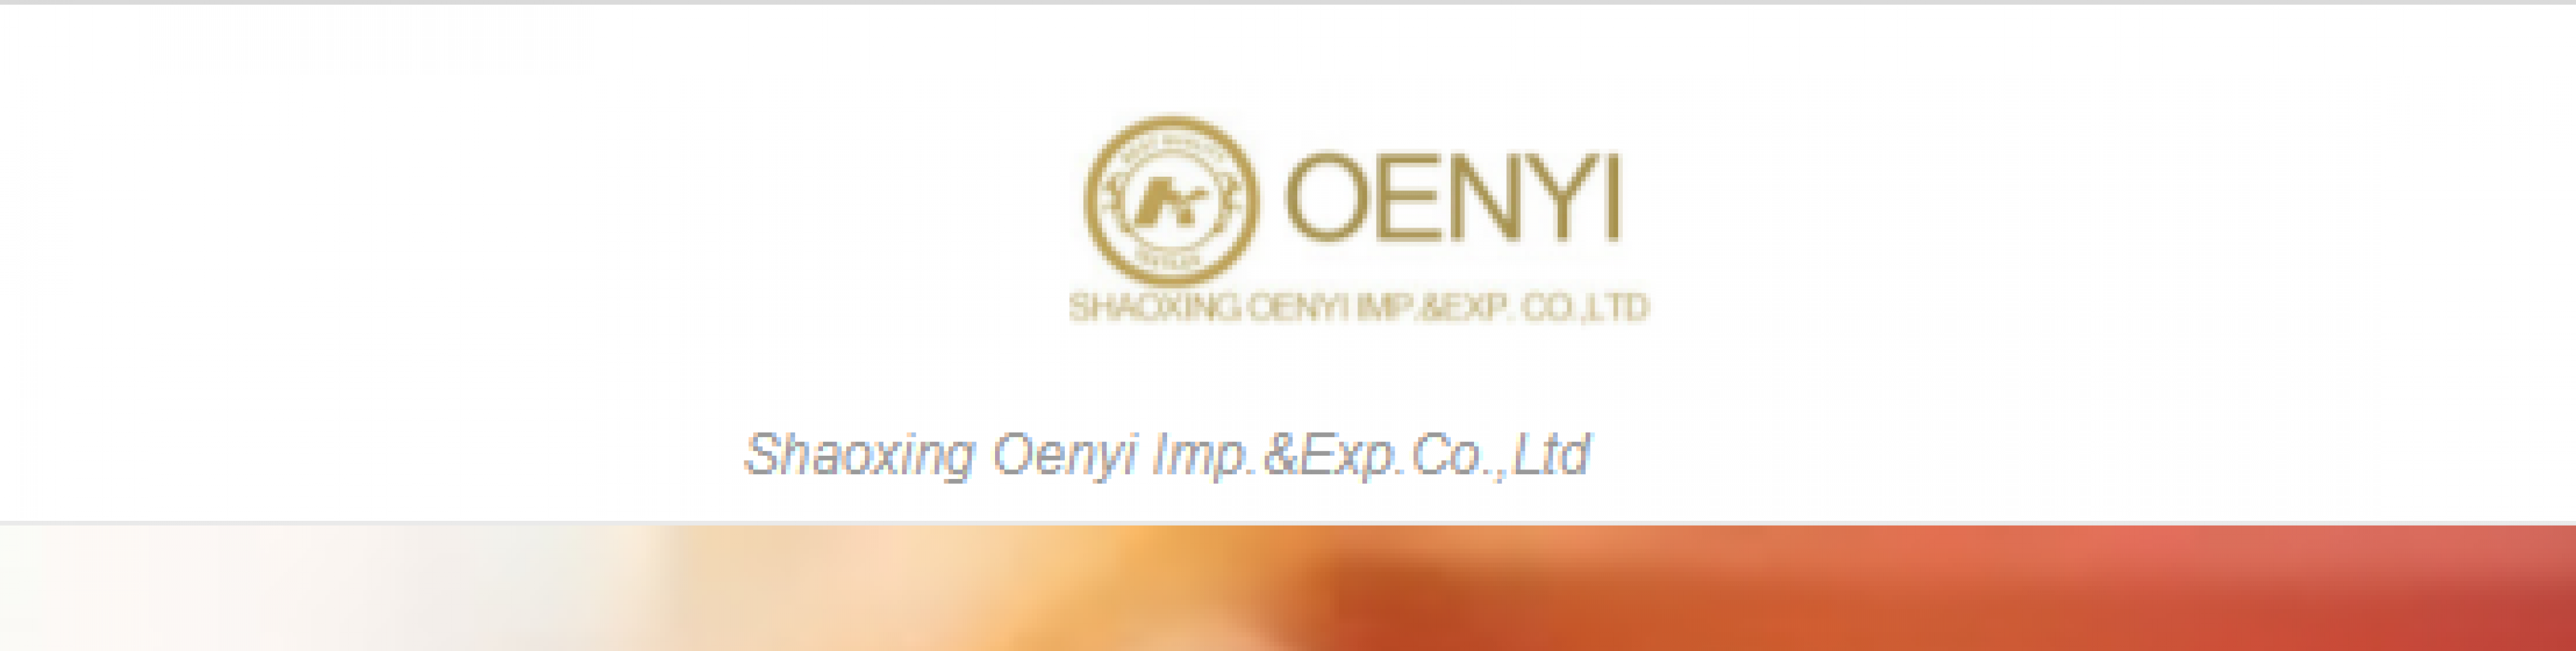 SHAOXING OENYI IMP & EXP  CO., LTD.